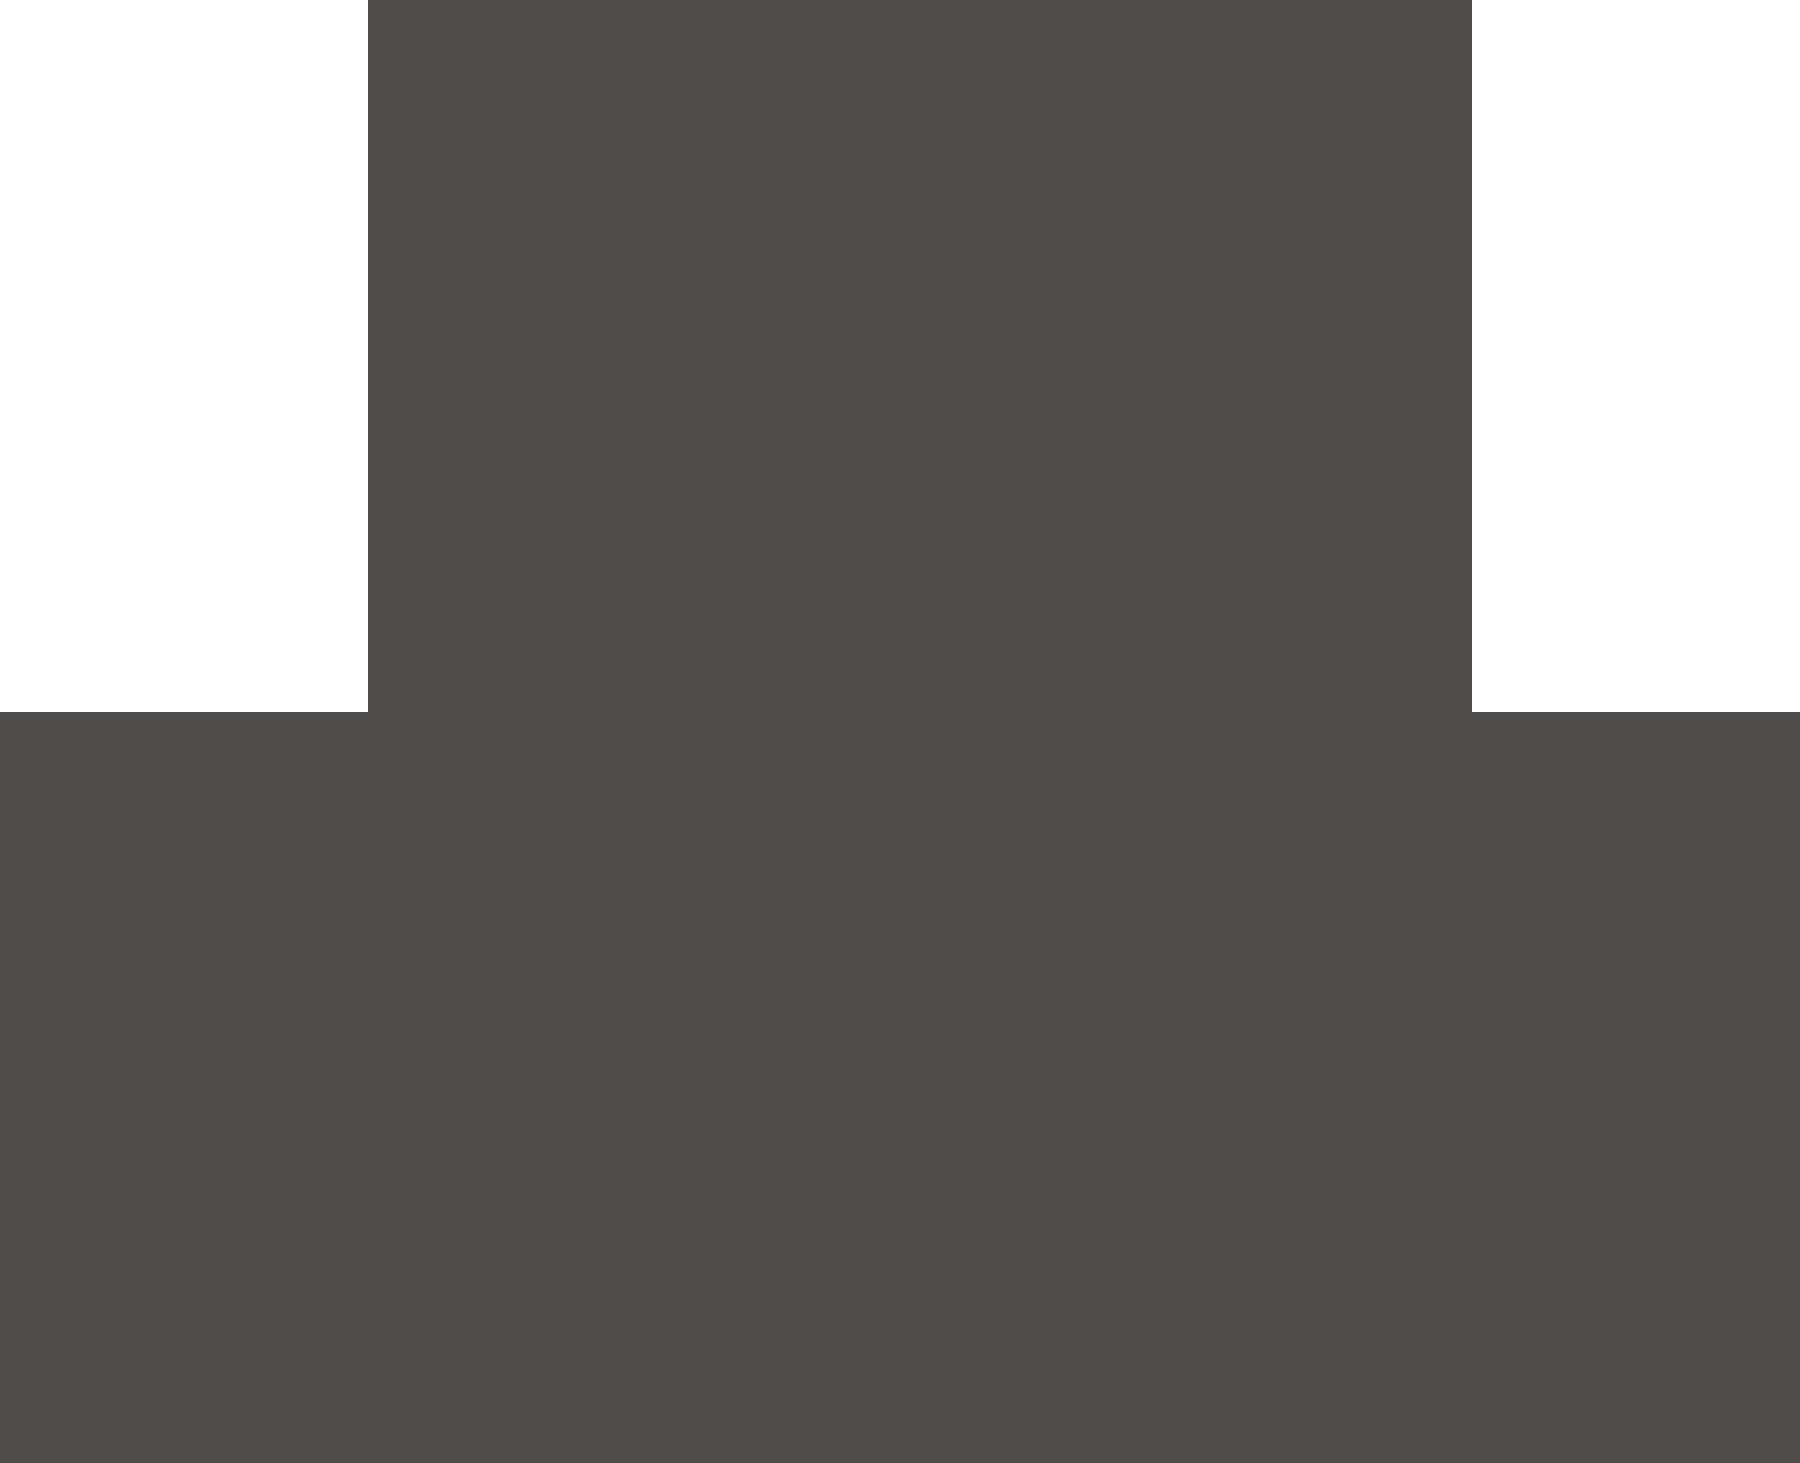 Borculo CSI logo